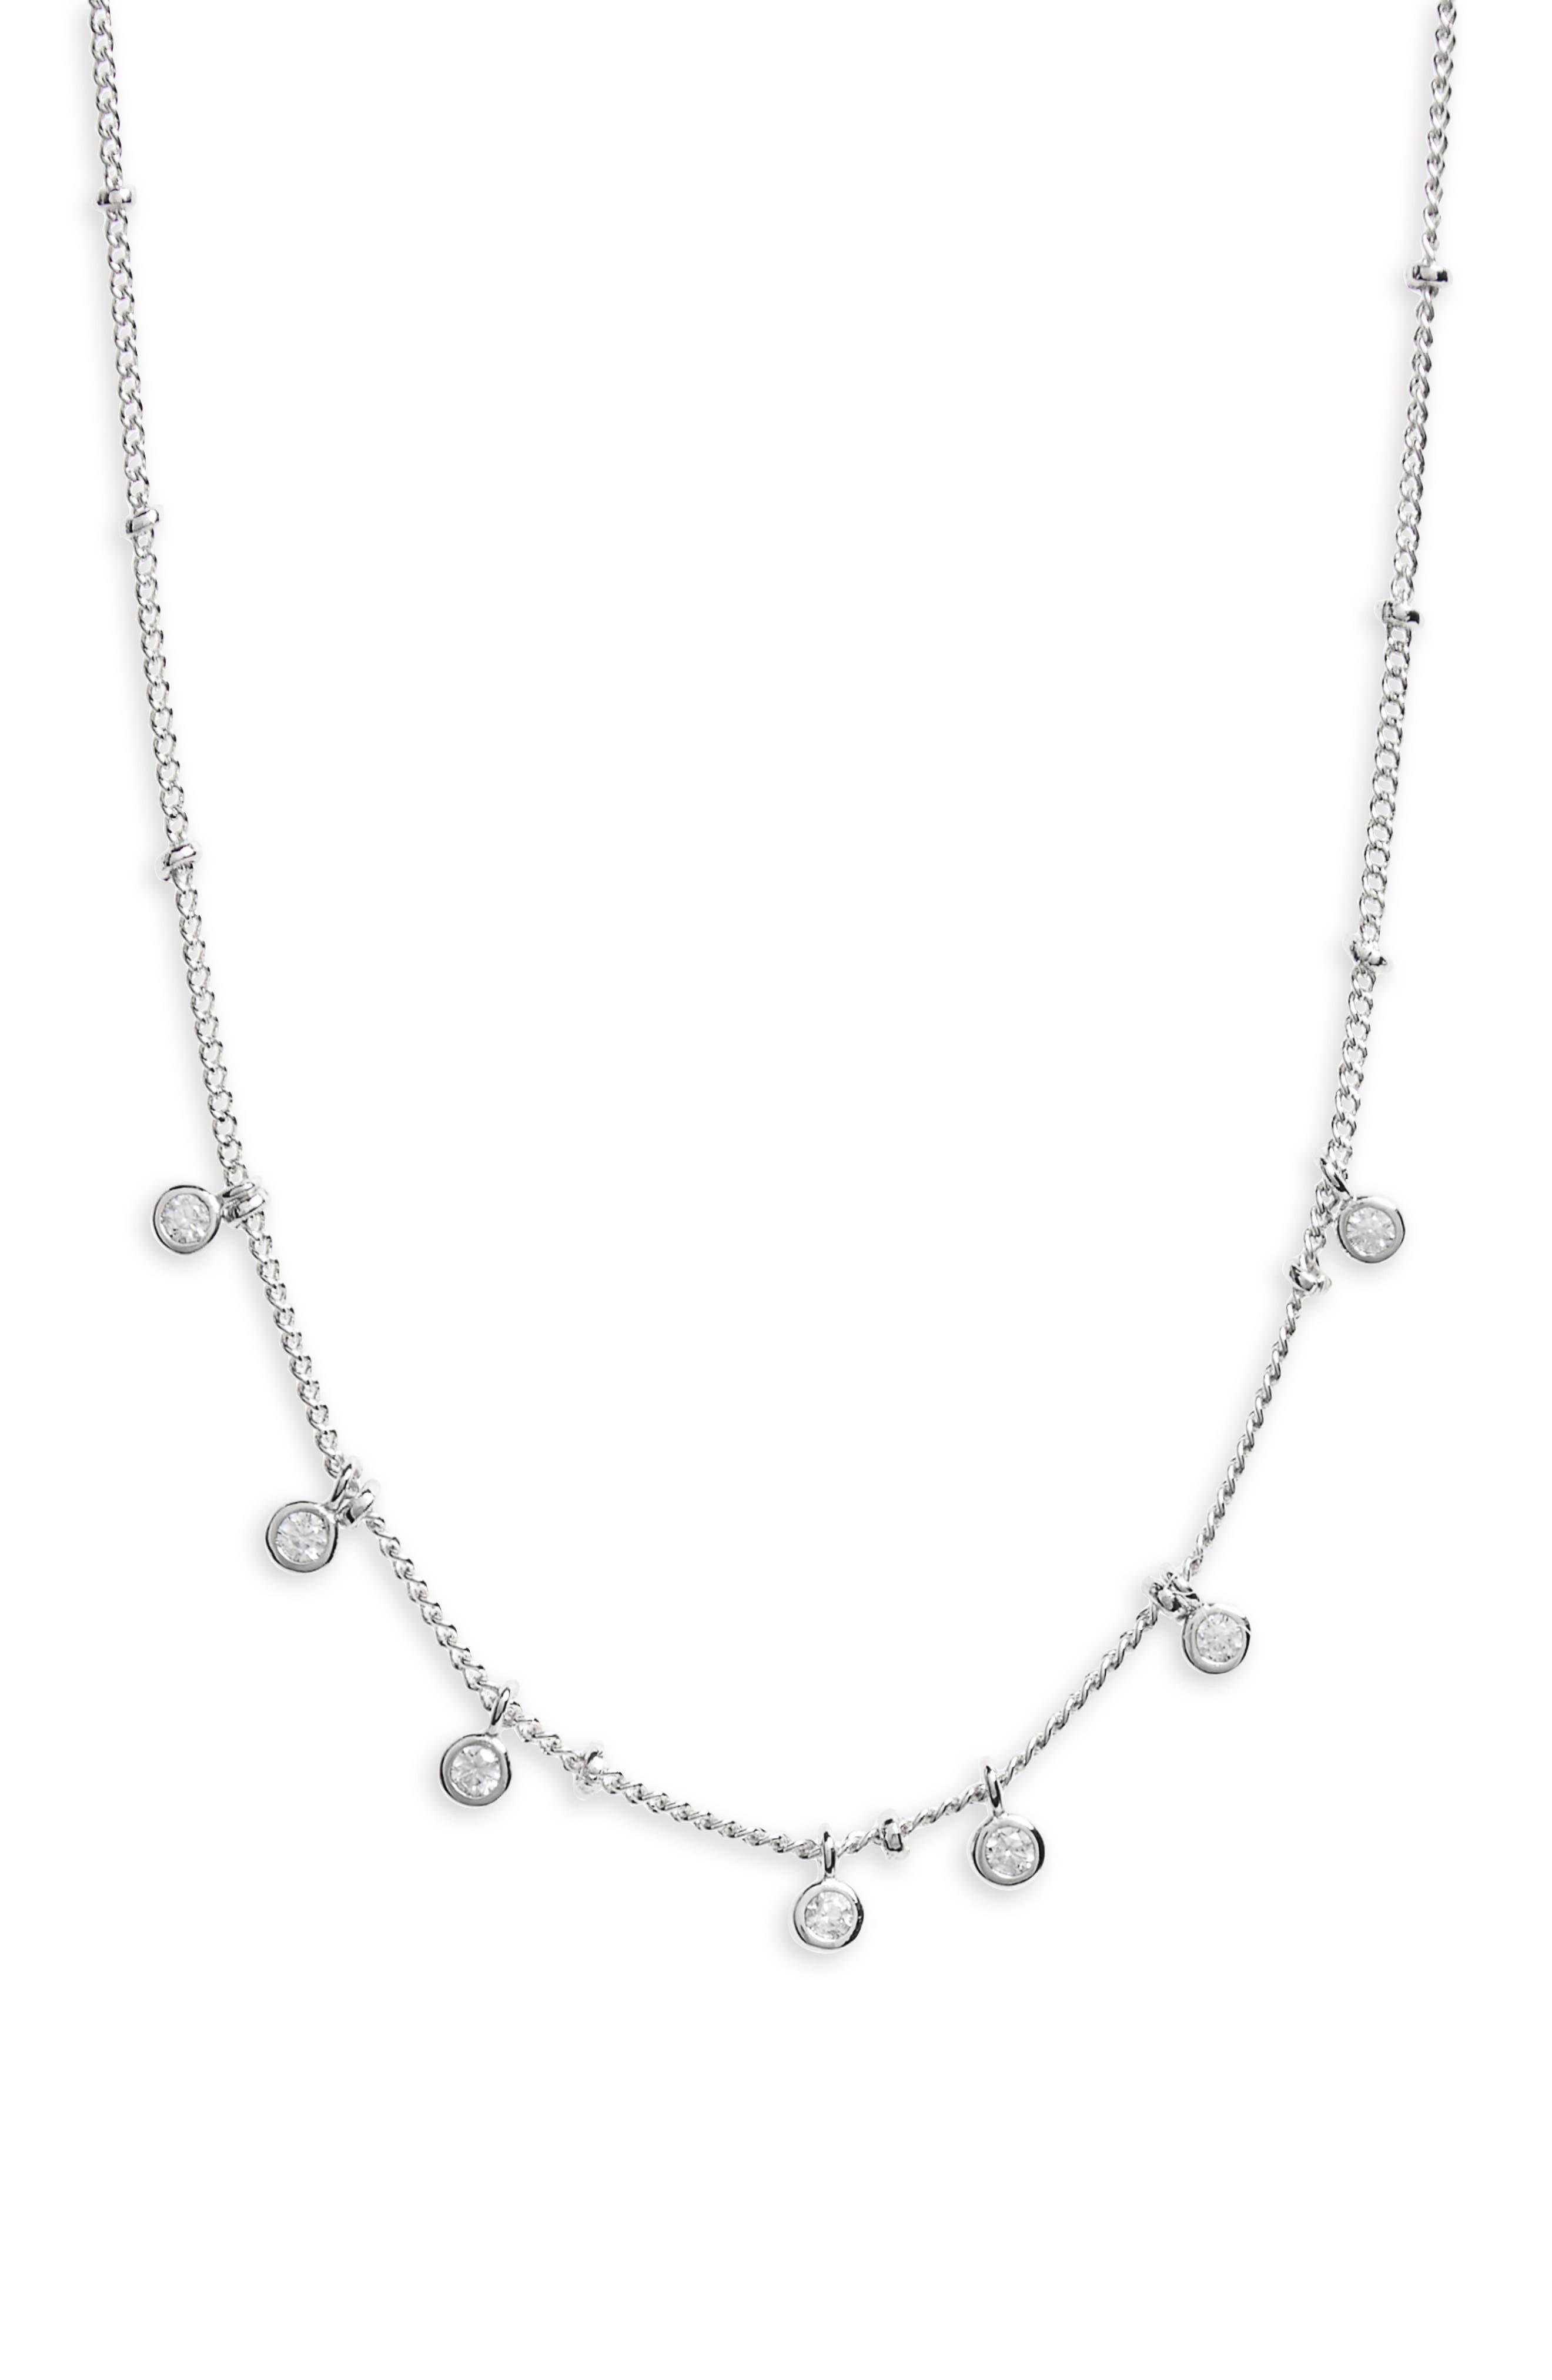 Main Image - Melanie Auld Floating Disc Collar Necklace